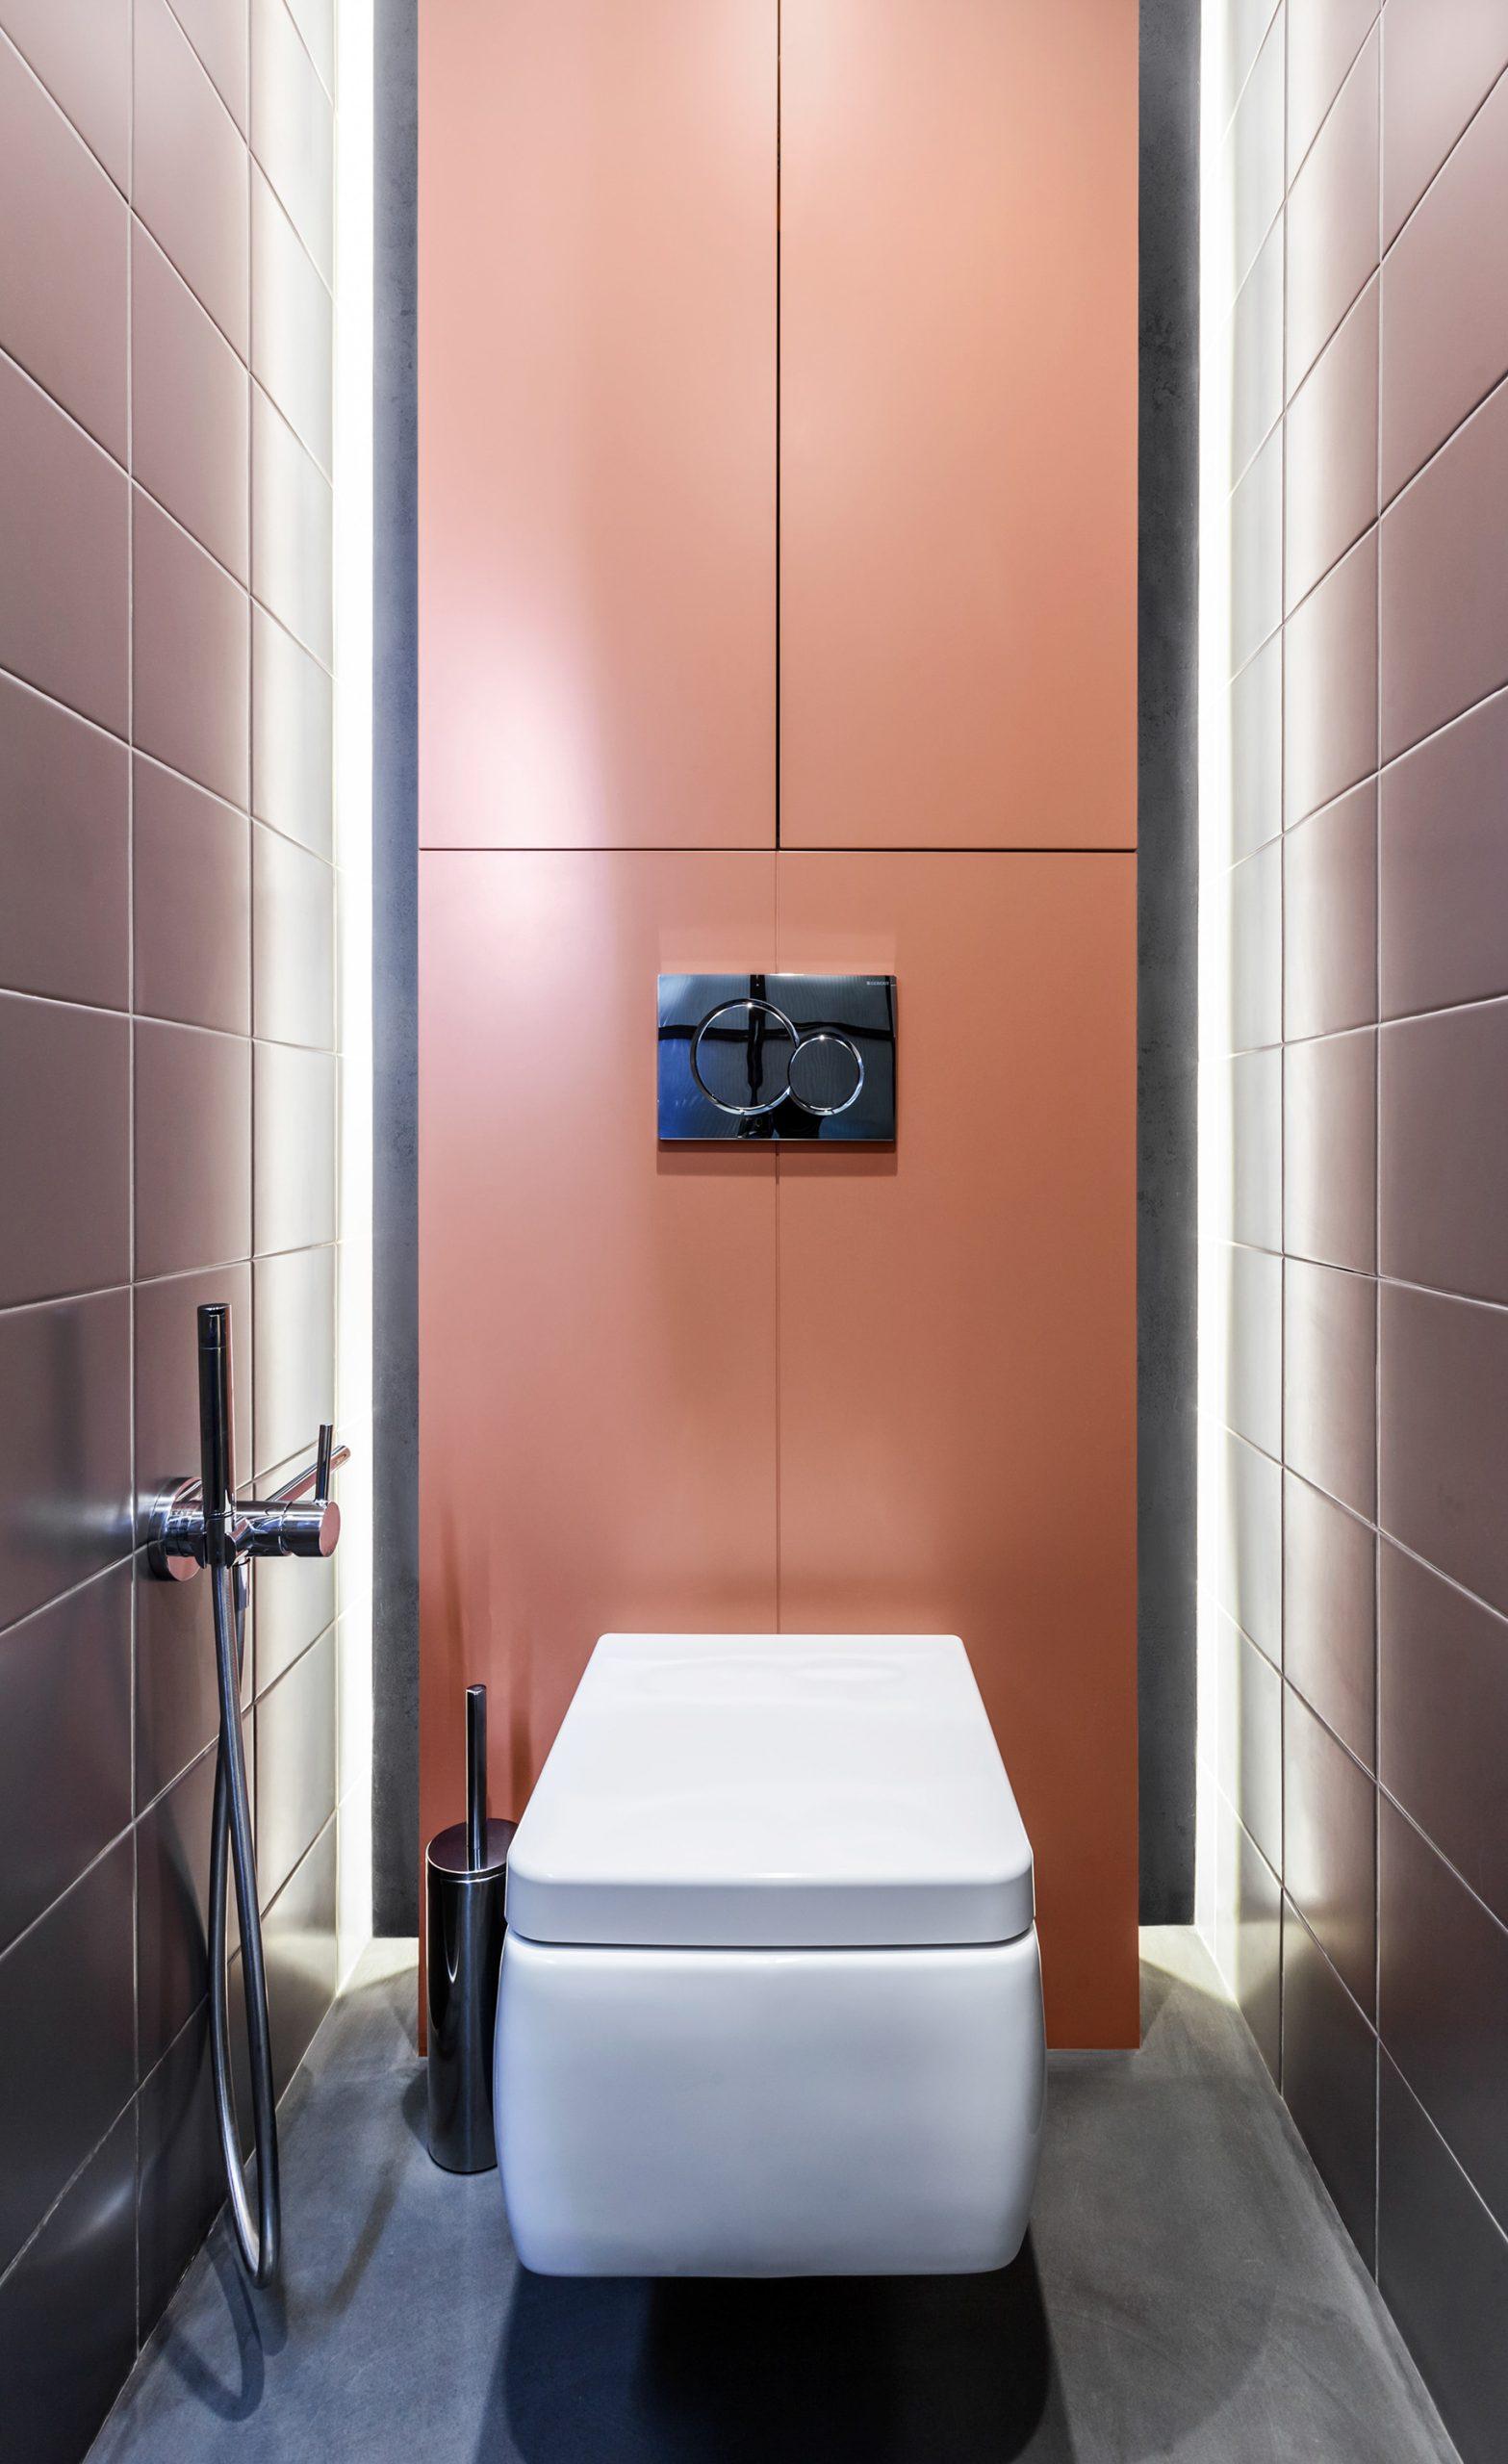 Sonyachna Brama Apartment Interior Design Kiev, Ukraine – Lugerin Architects